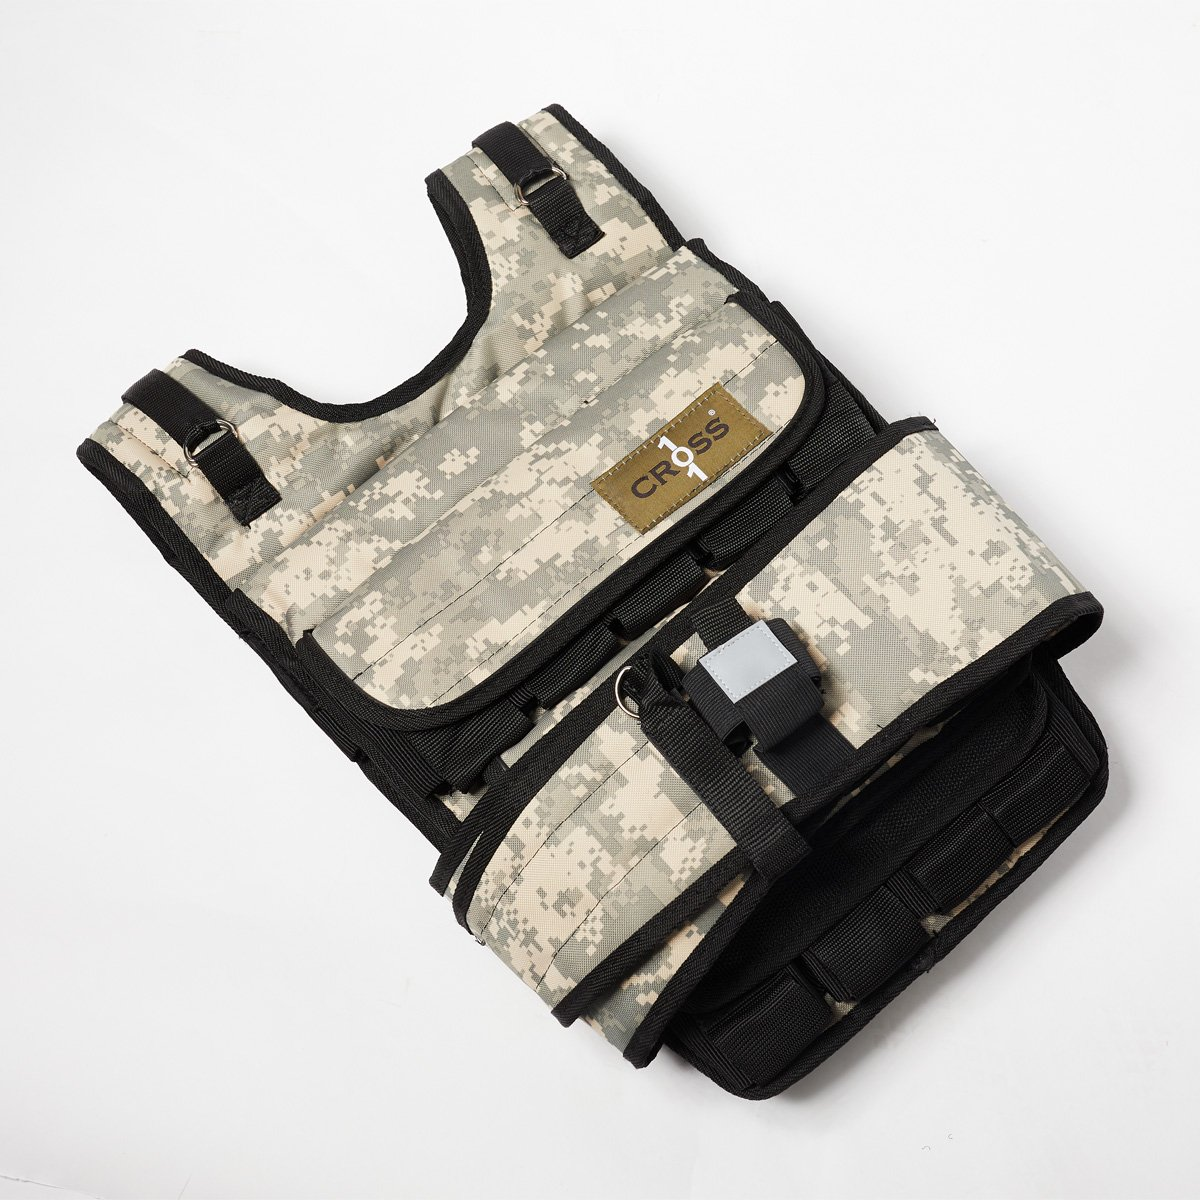 CROSS101 Adjustable Camouflage Weighted Vest 12LBS - 140LBS (Desert - 100LBS)